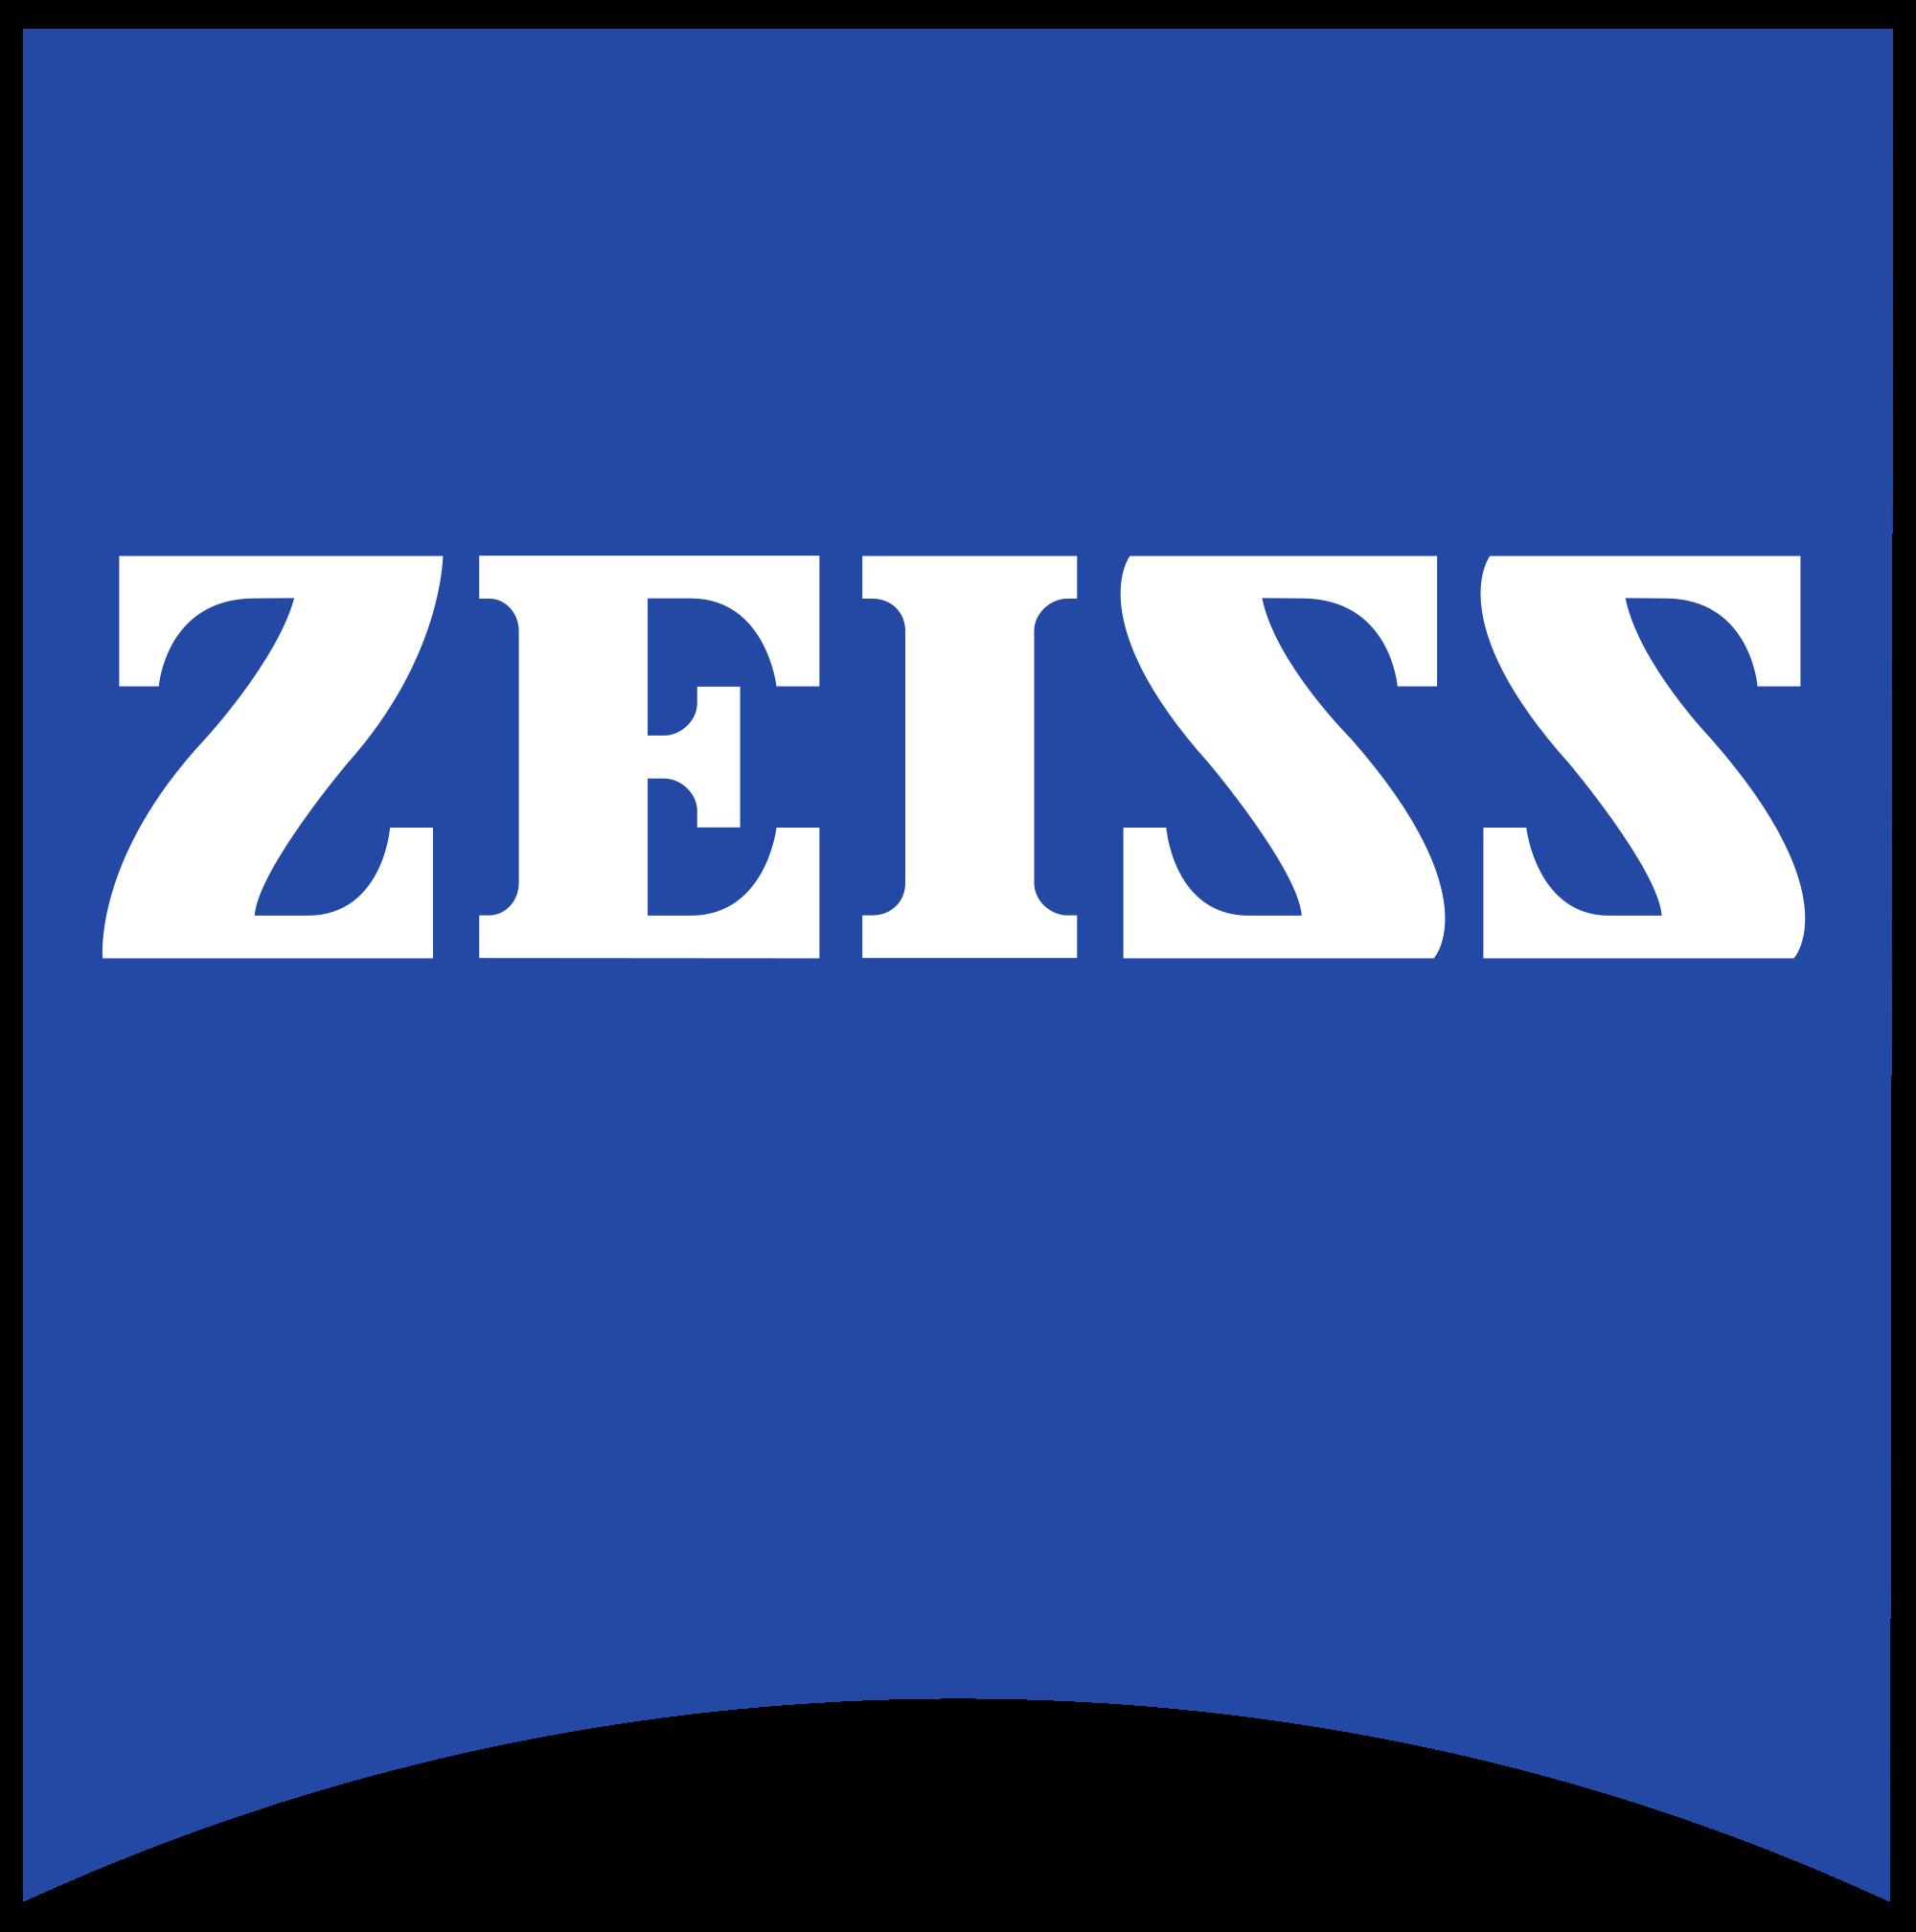 Carl_Zeiss_Logo.png